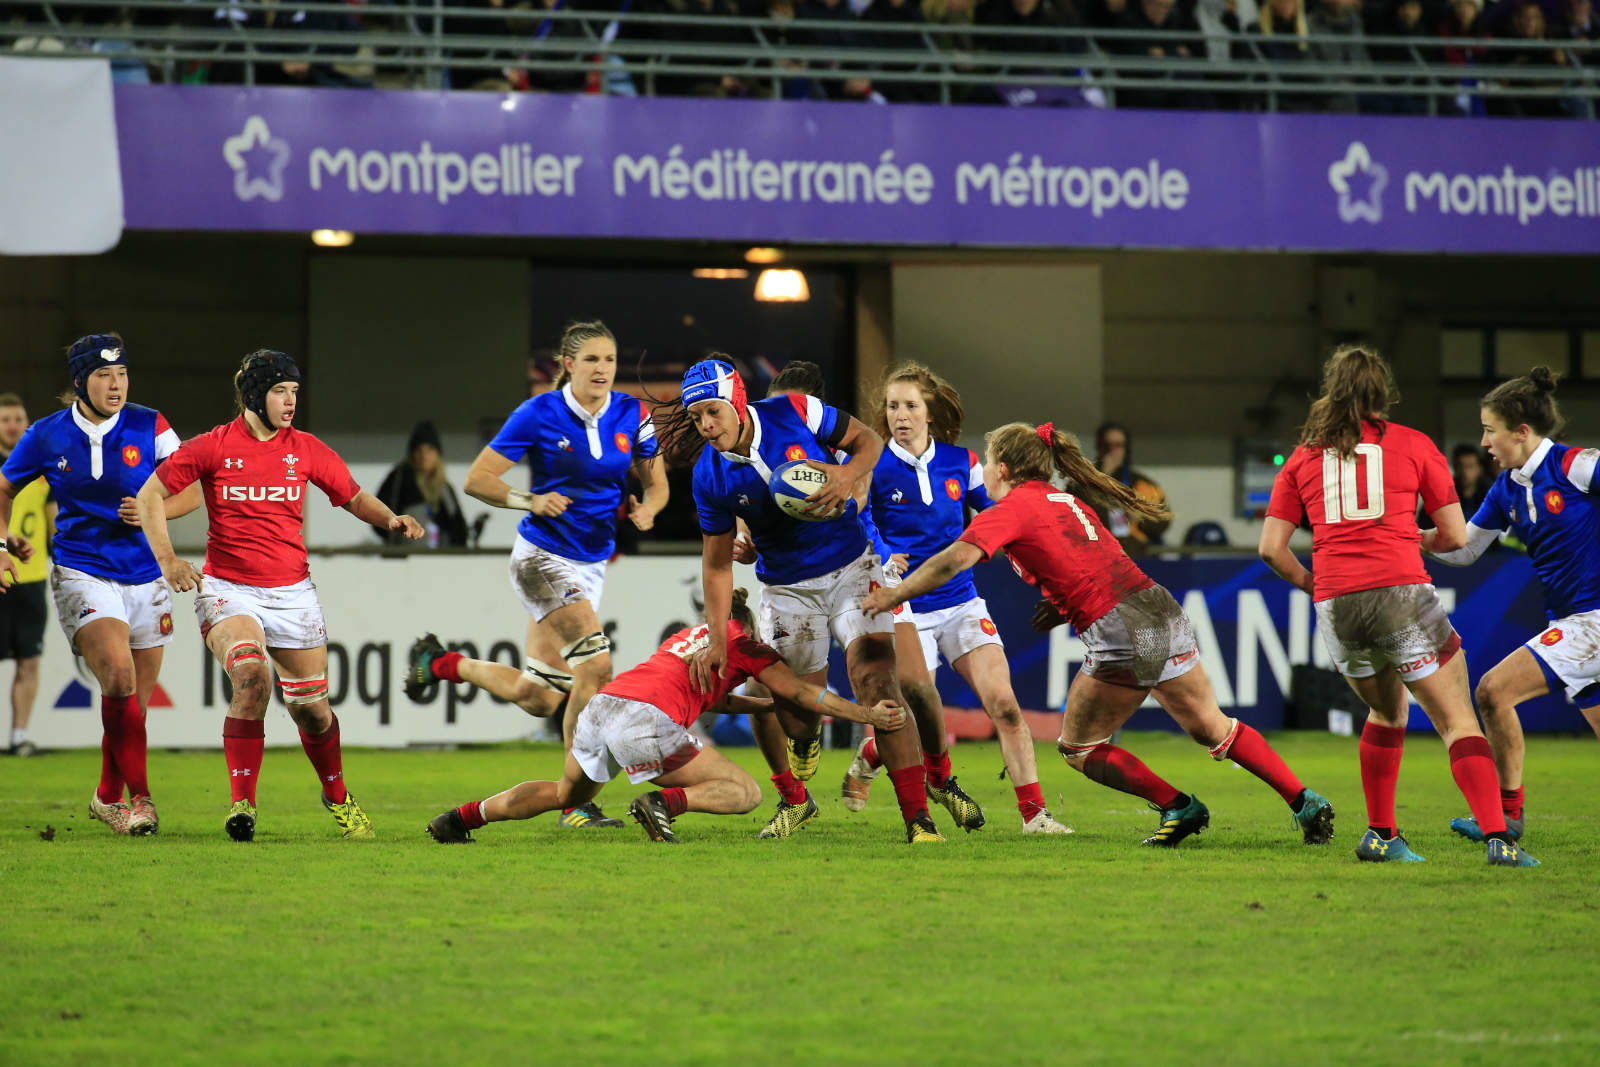 Super Rugby Calendrier.Xv De France Feminin Federation Francaise De Rugby